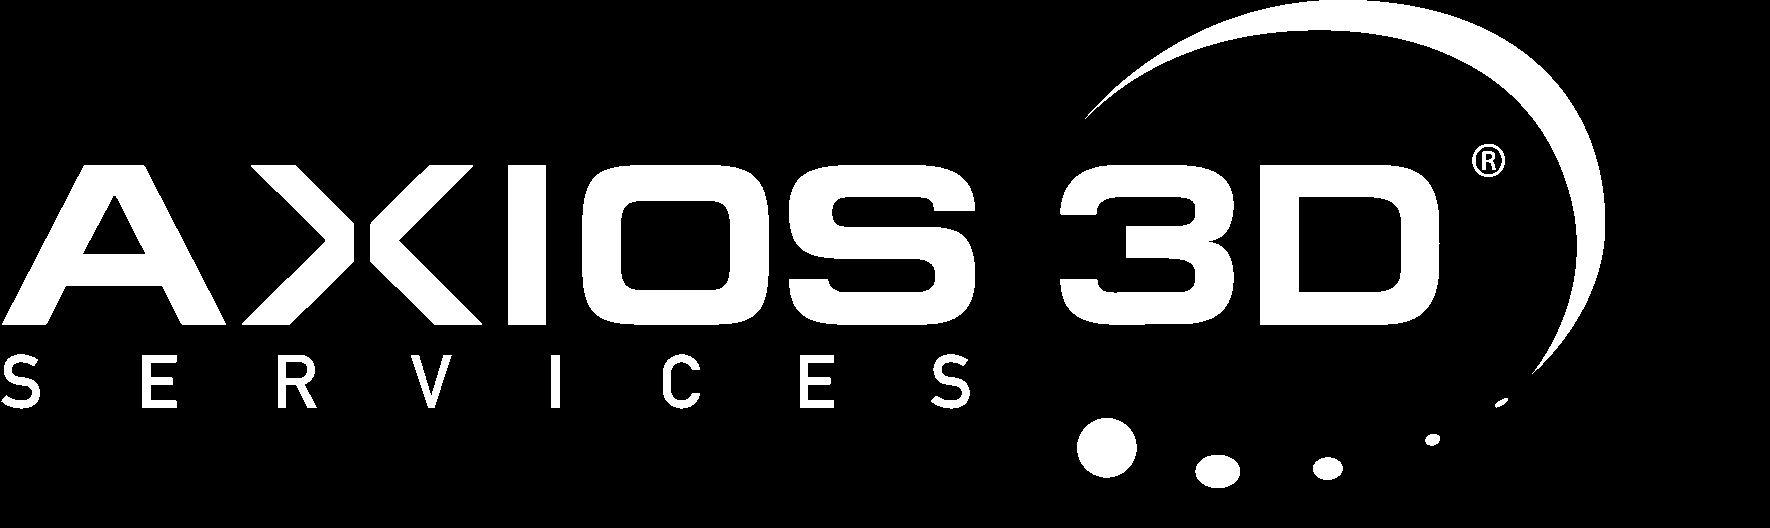 Axios 3D Logo S/W